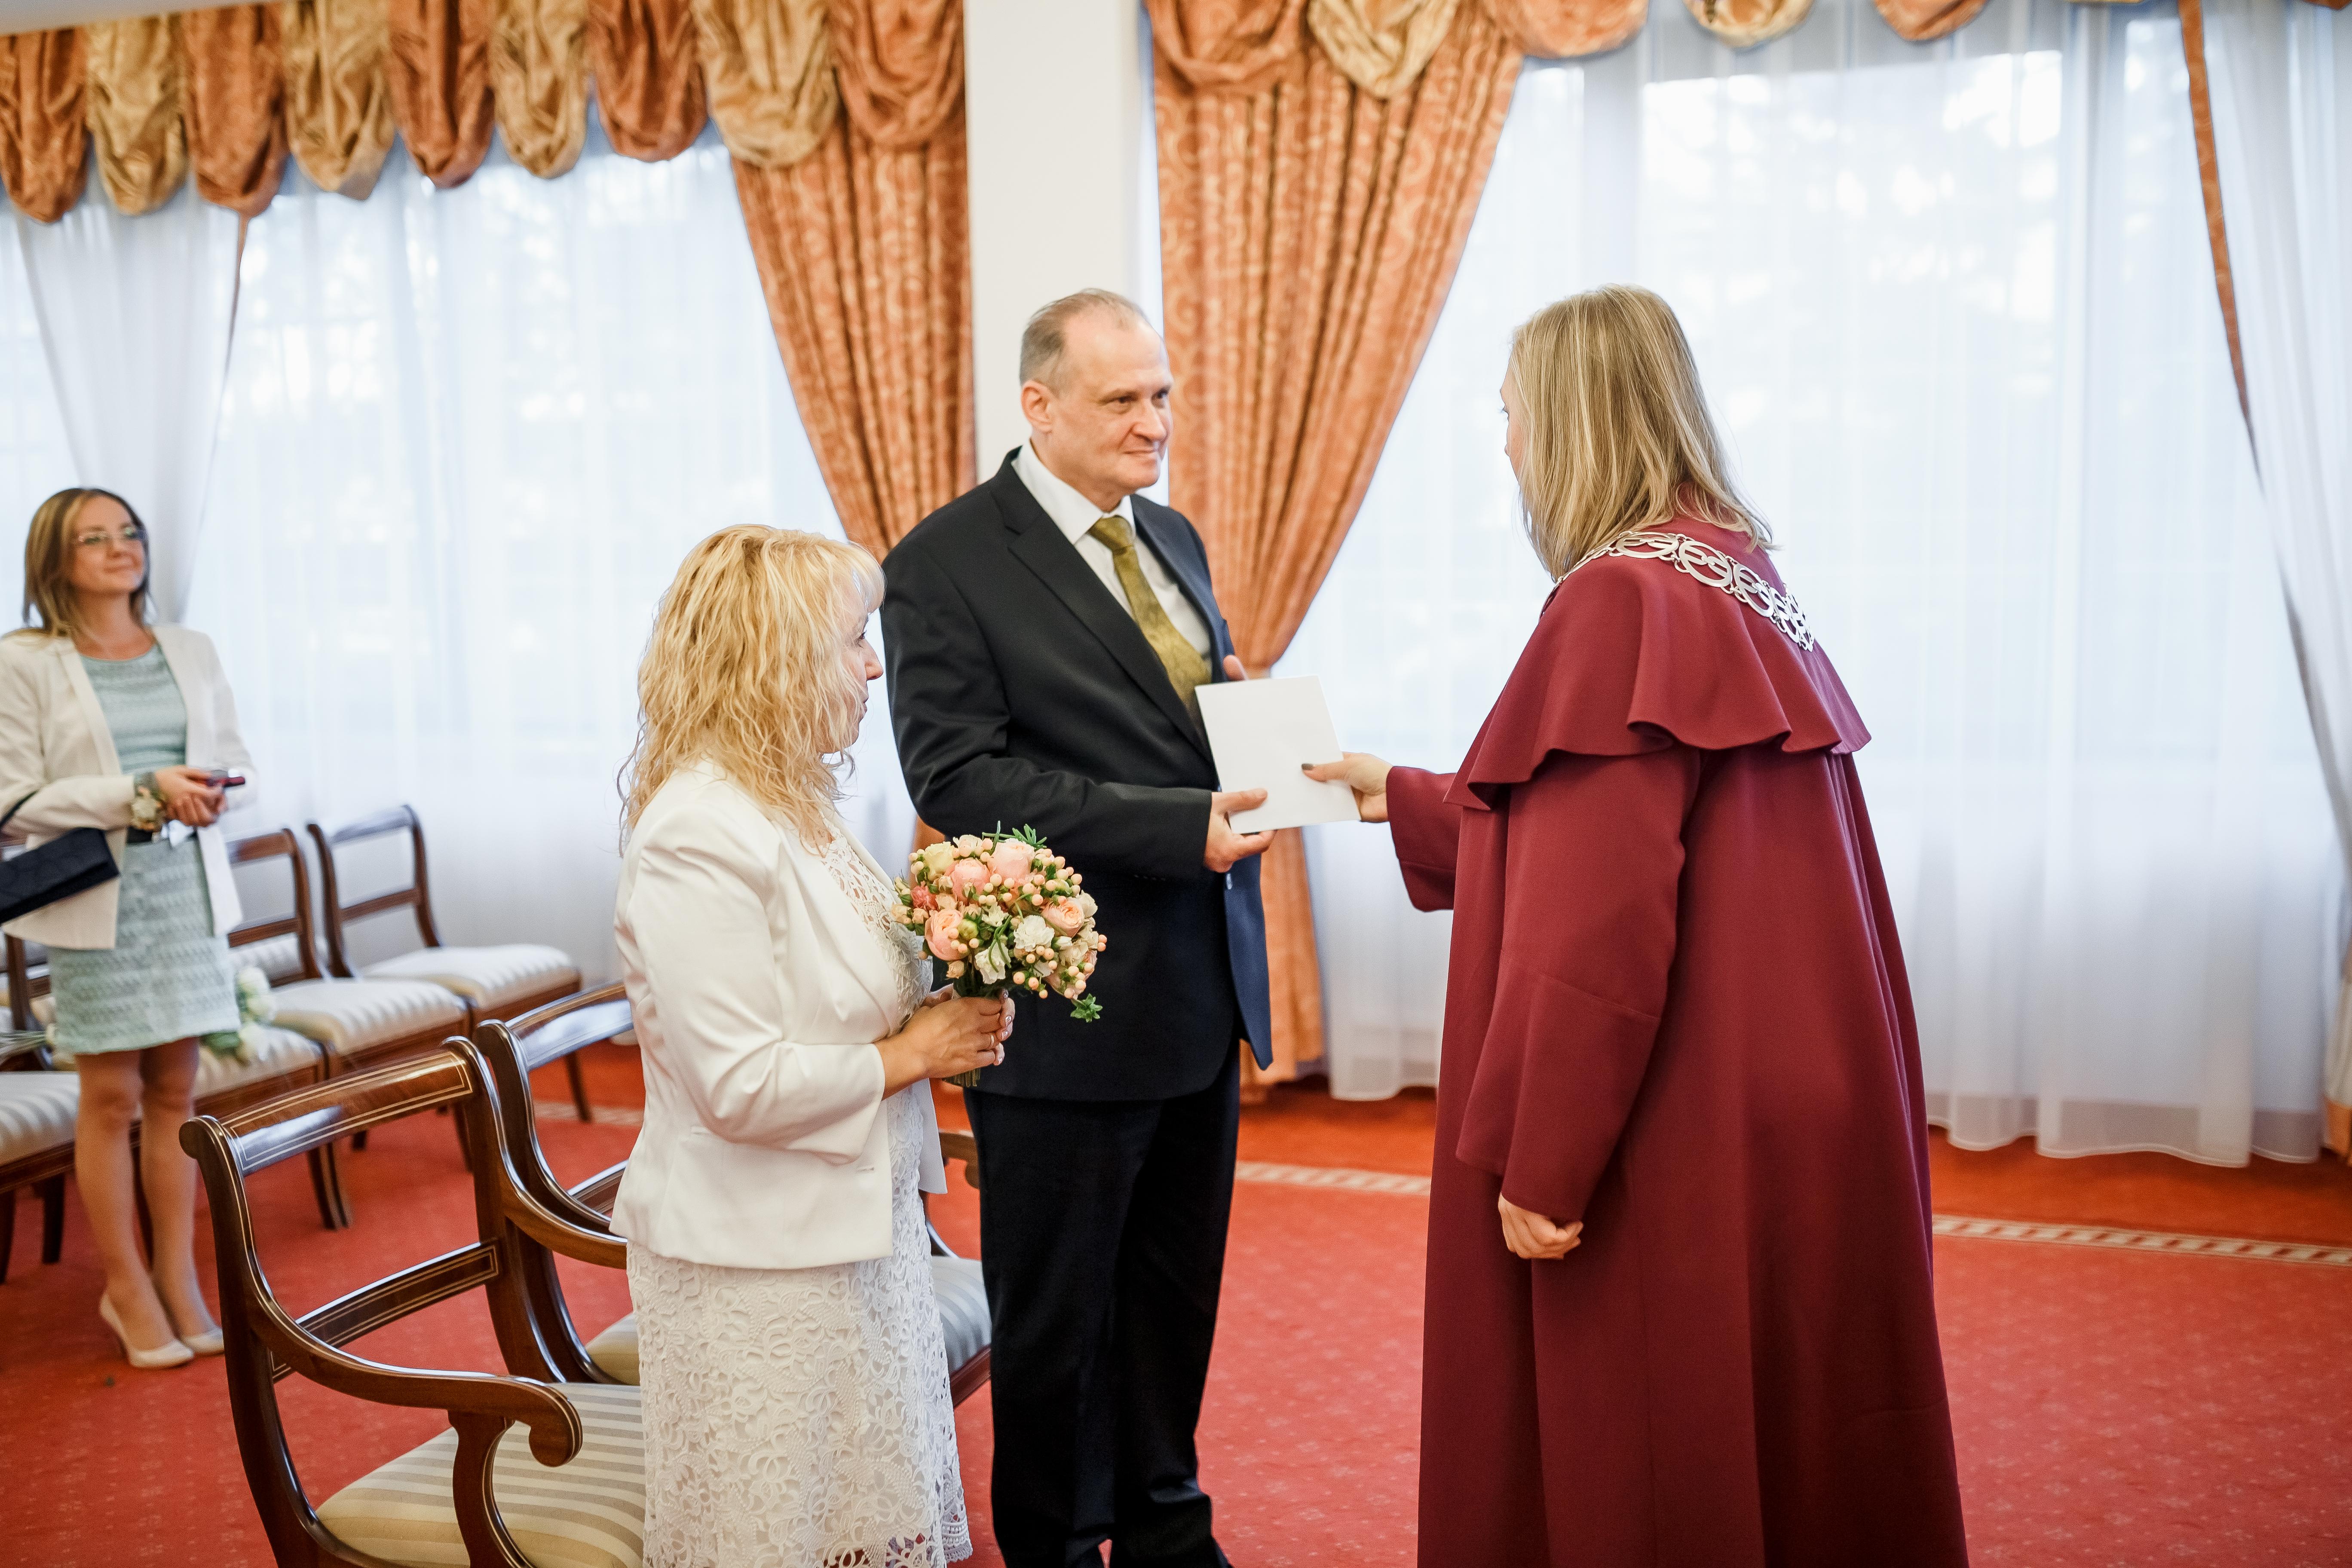 Замуж за поляка, какие трудности и сложности предстоят перед тем как выйти замуж за поляка-12